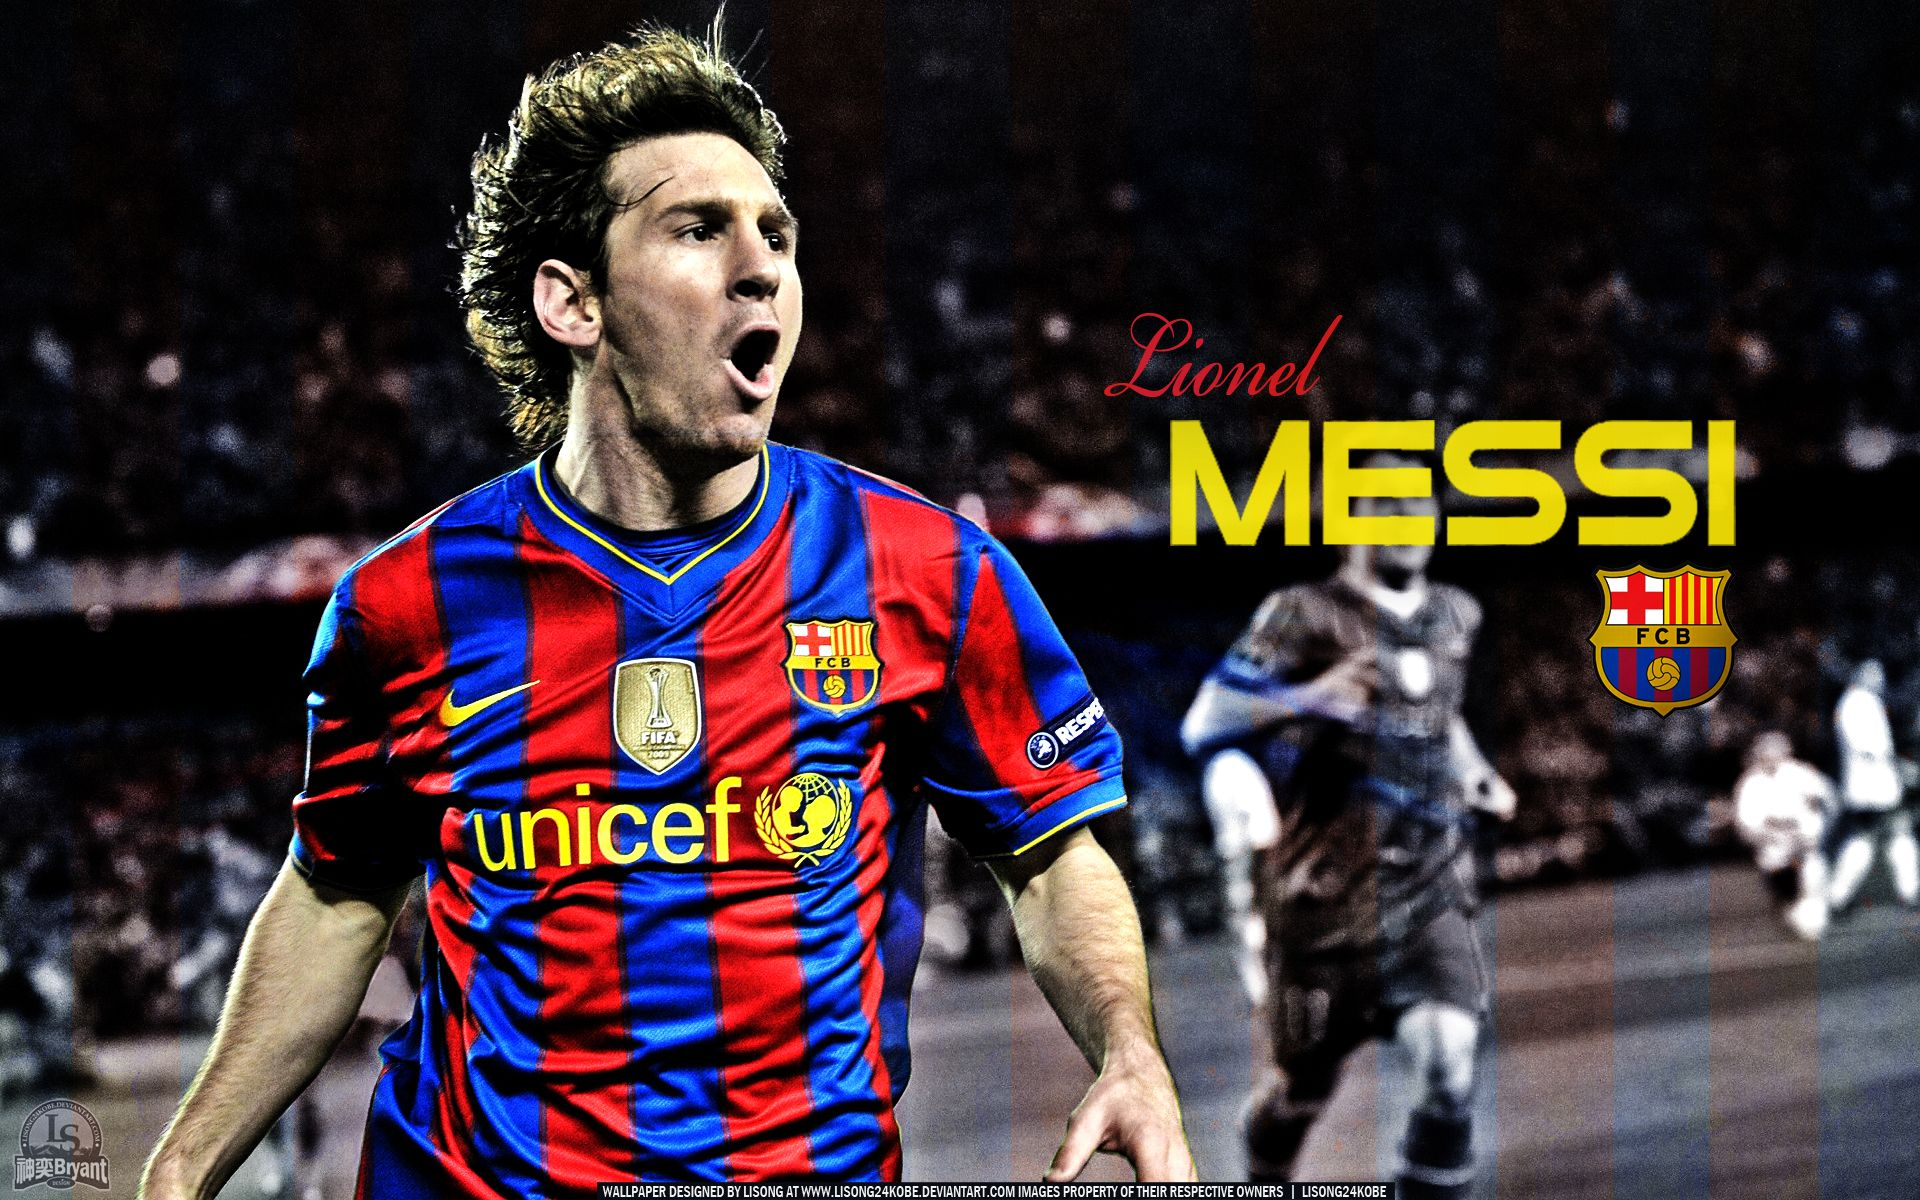 messi wallpaper 2014 hd | fifa worldcup | pinterest | messi